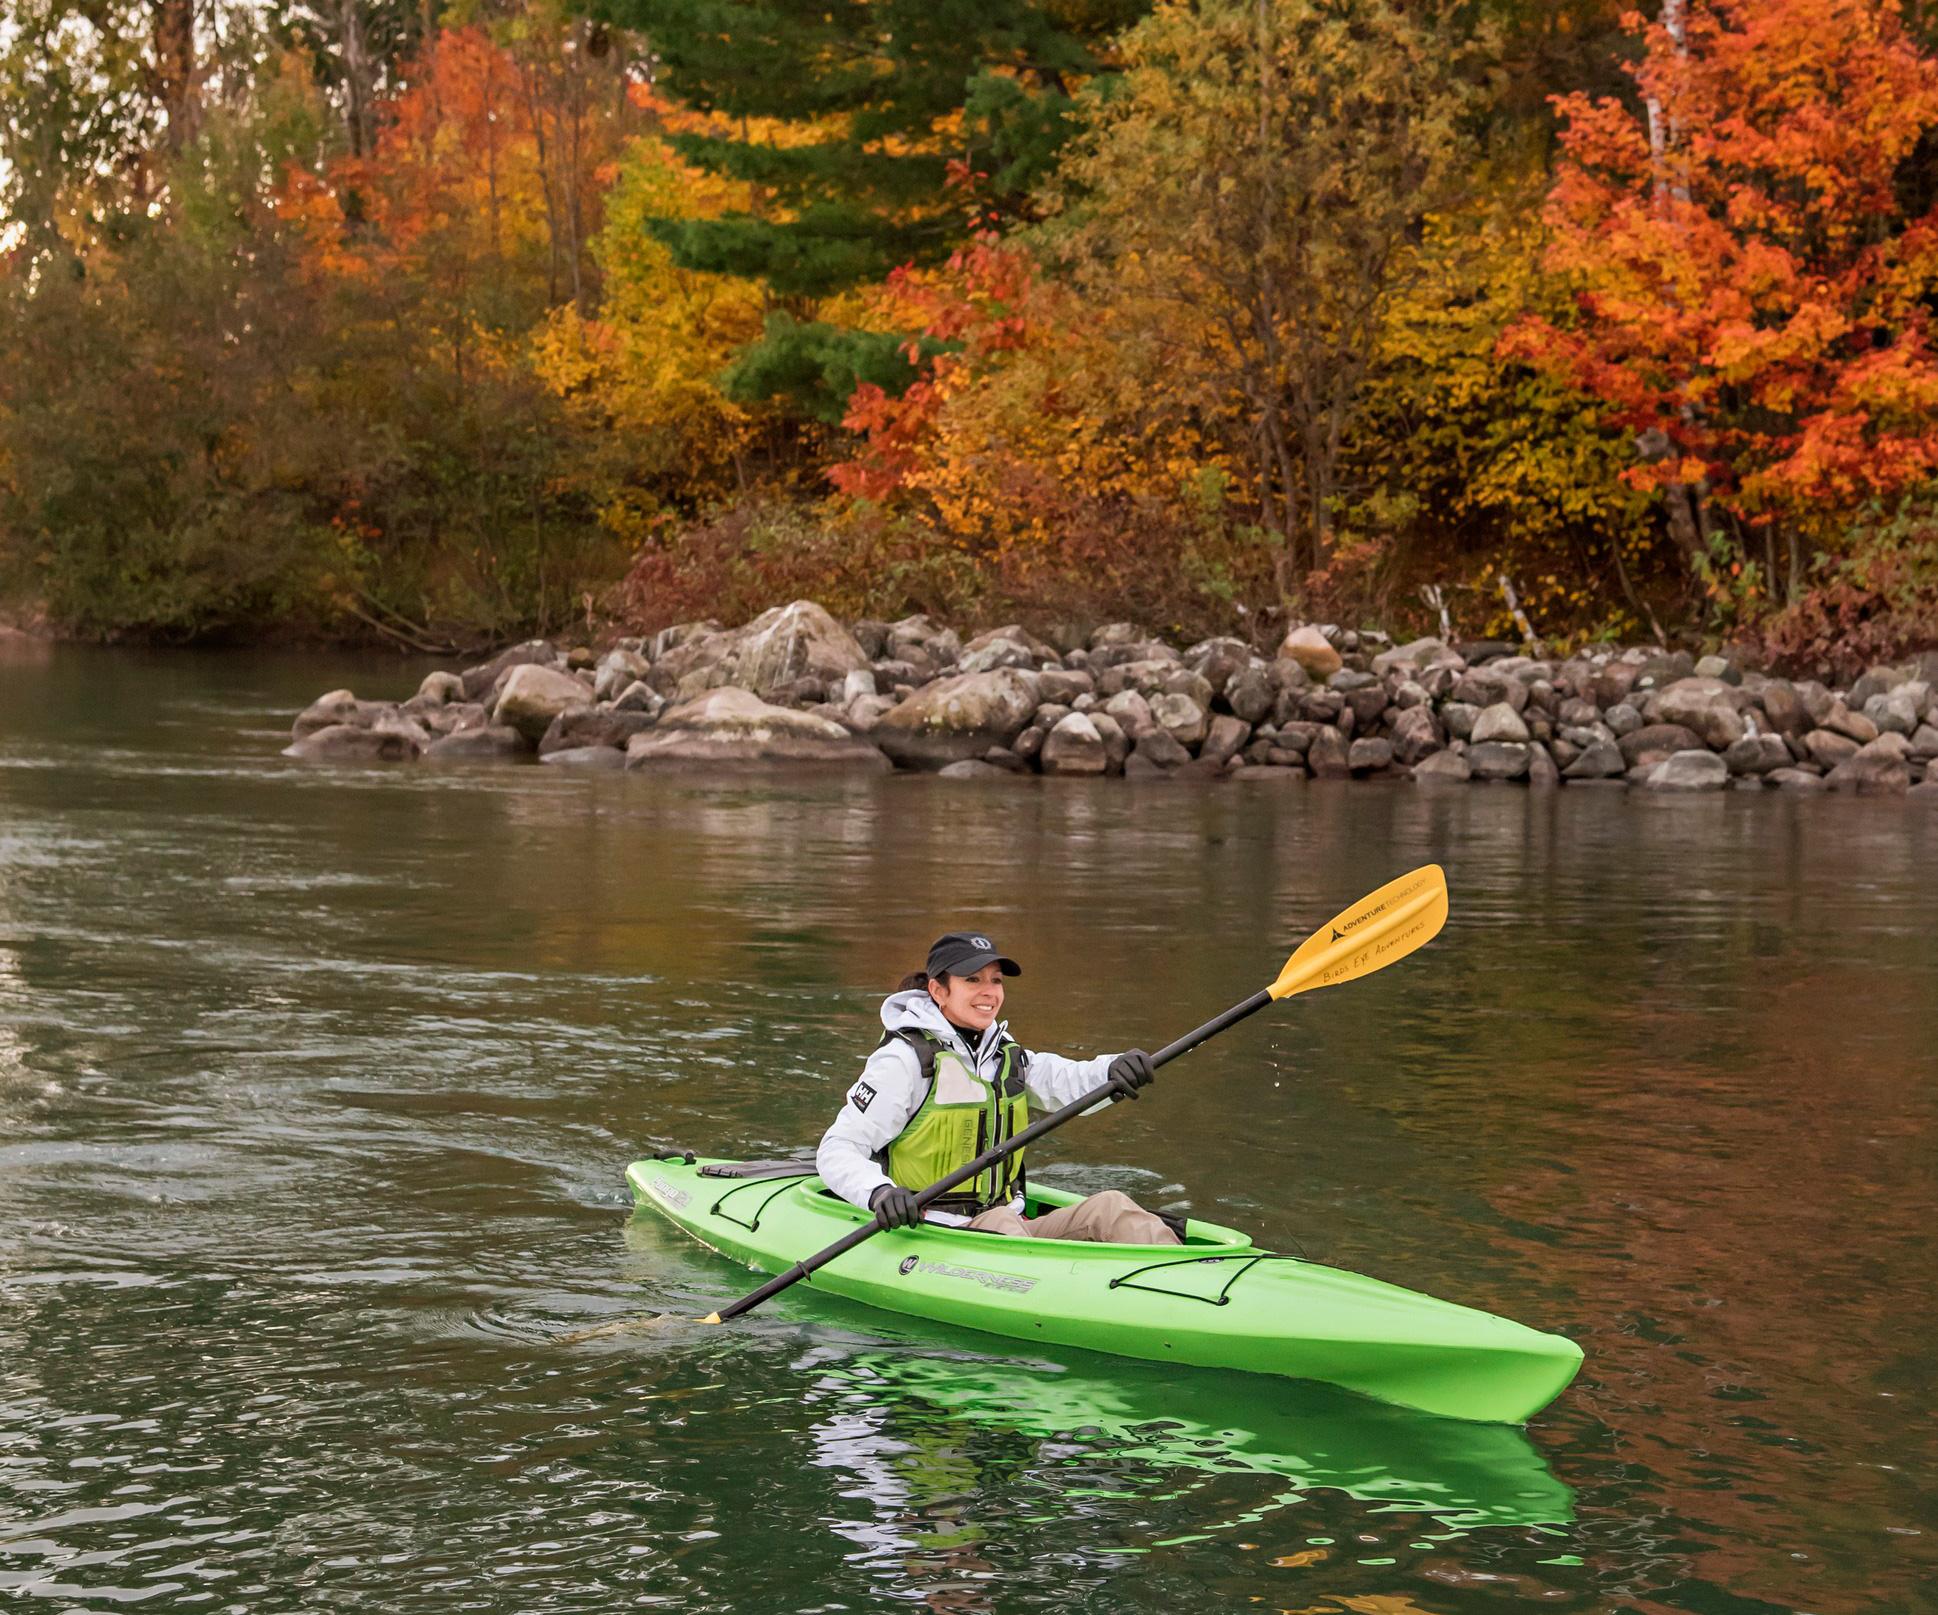 SSM Kayaking-AaronPeterson.jpg